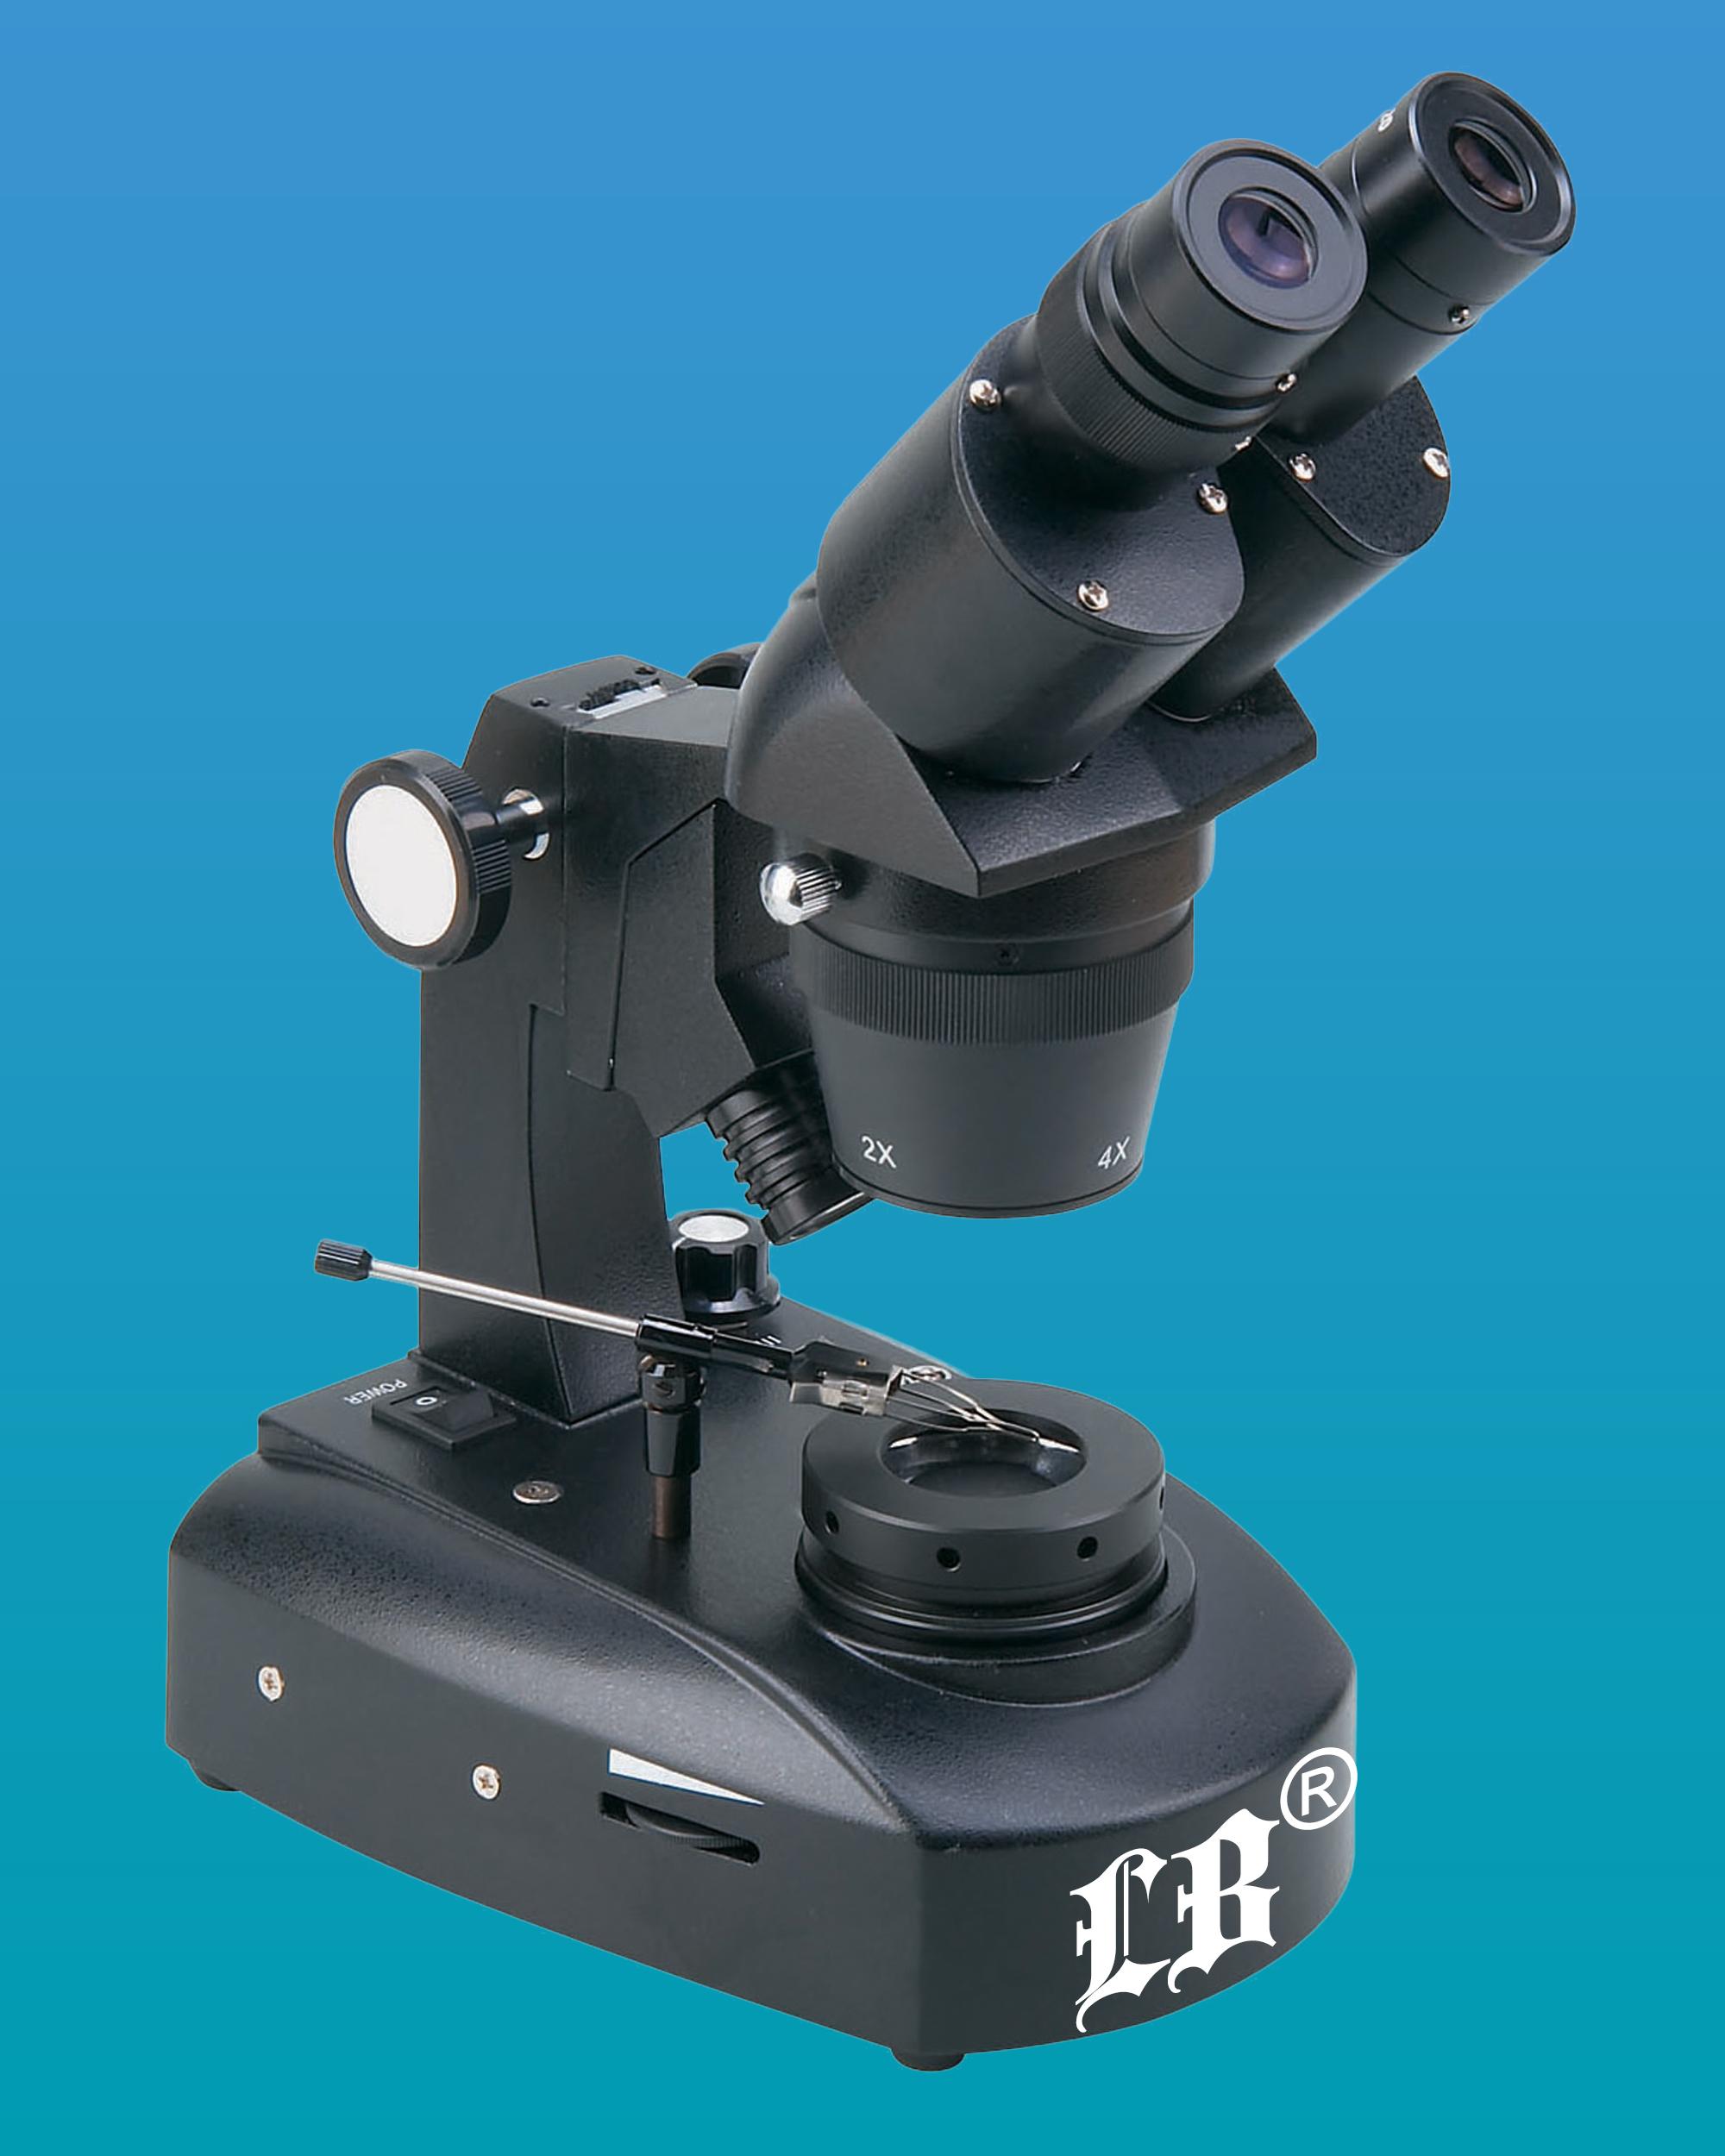 [LB-864] Trinocular Gemological Microscope w/ Wide Field & Fluorescent Illumination